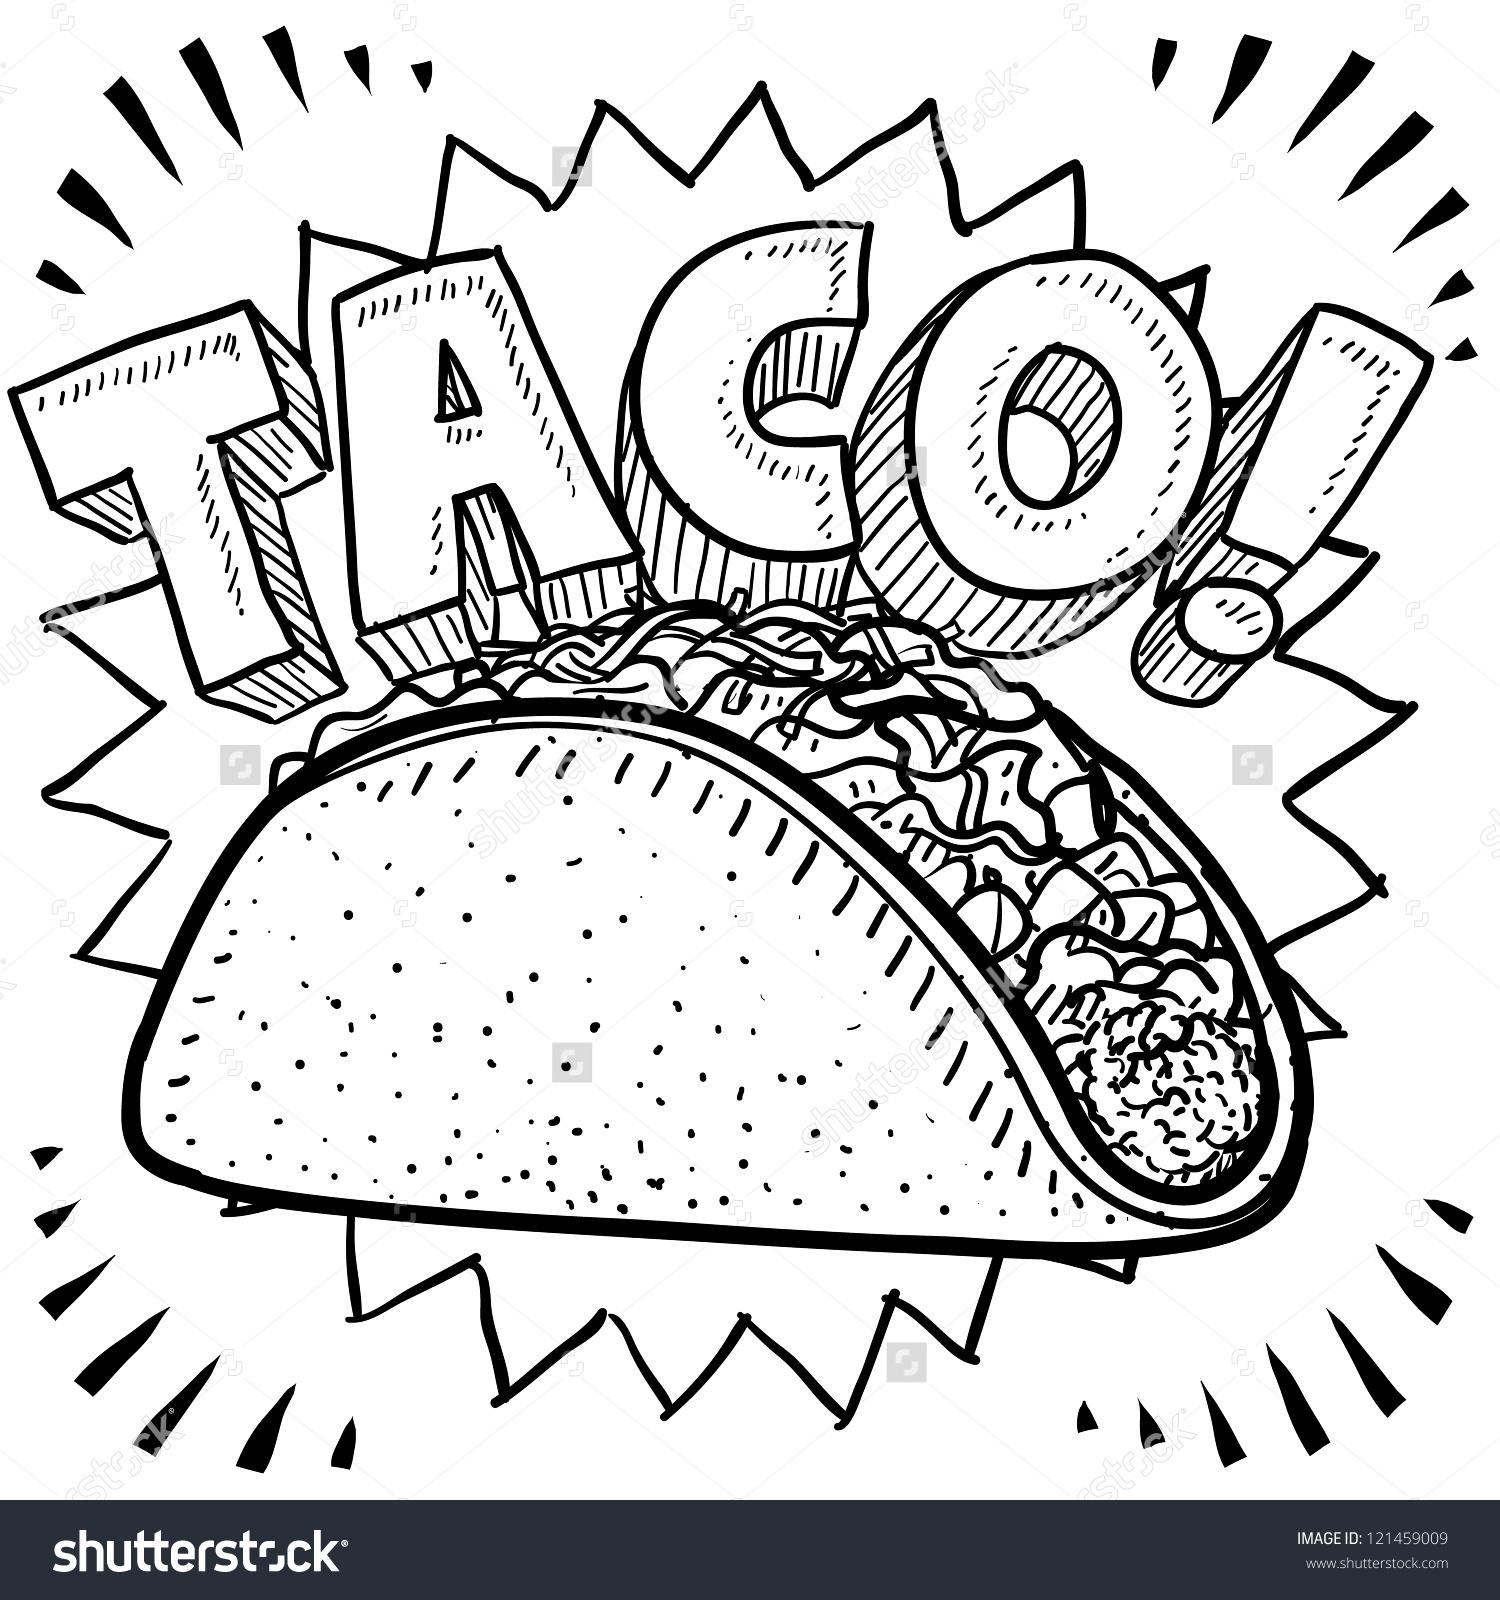 1500x1600 Drawn Tacos Mexican